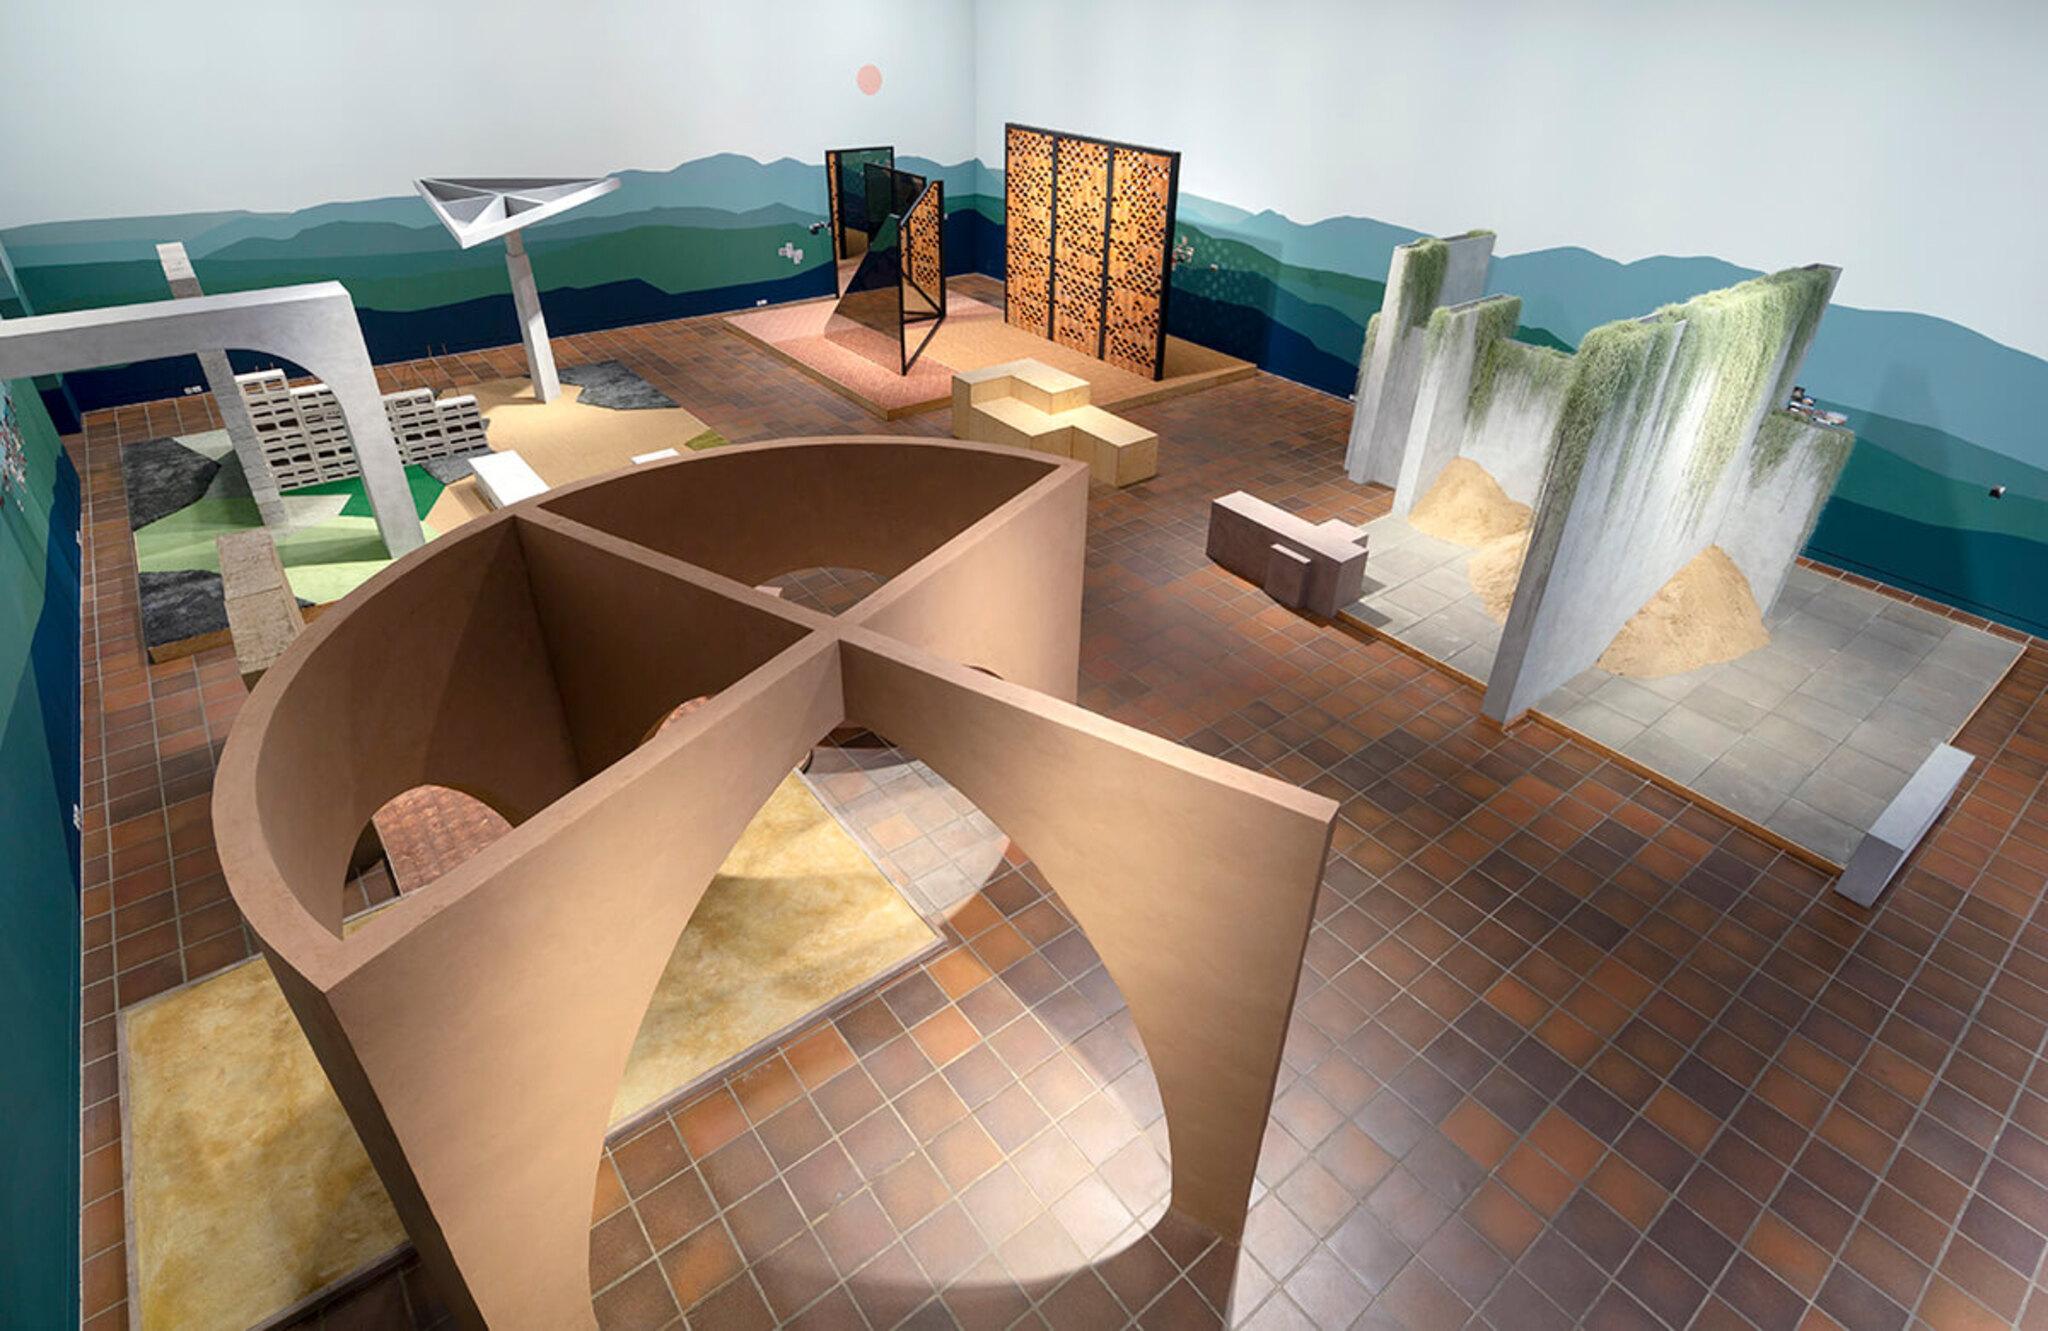 The Architect's Studio – Tatiana Bilbao